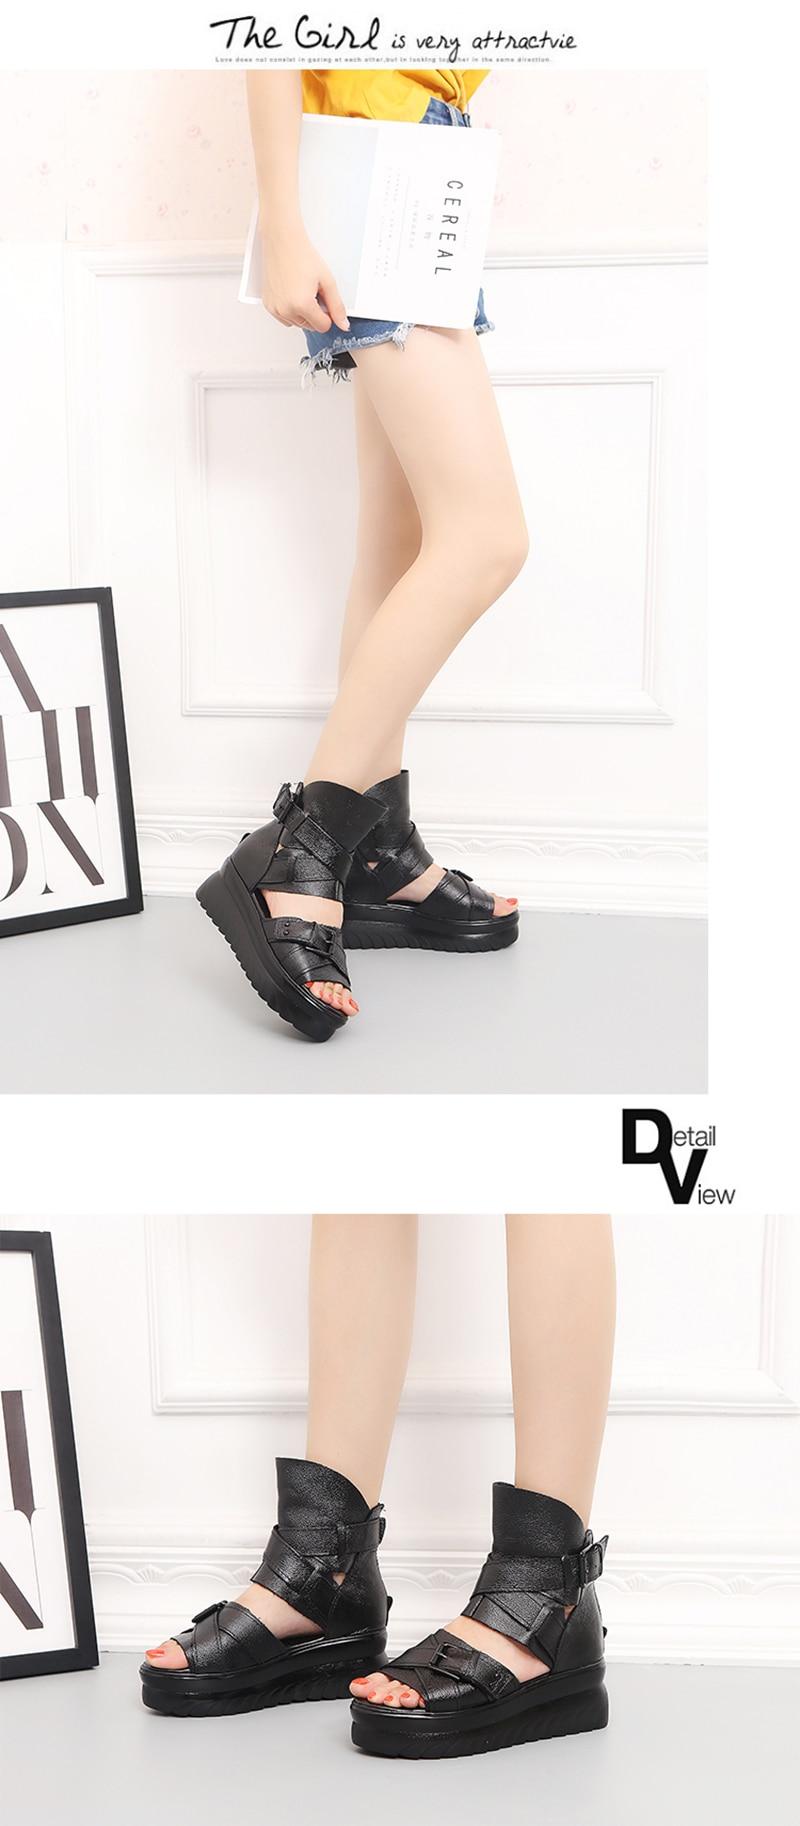 HTB1EJrZelKw3KVjSZFOq6yrDVXaq ADBOOV Genuine Leather Platform Sandals Women Summer Wedges Shoes For Women Sandalias De Verano Para Mujer Size 35-43